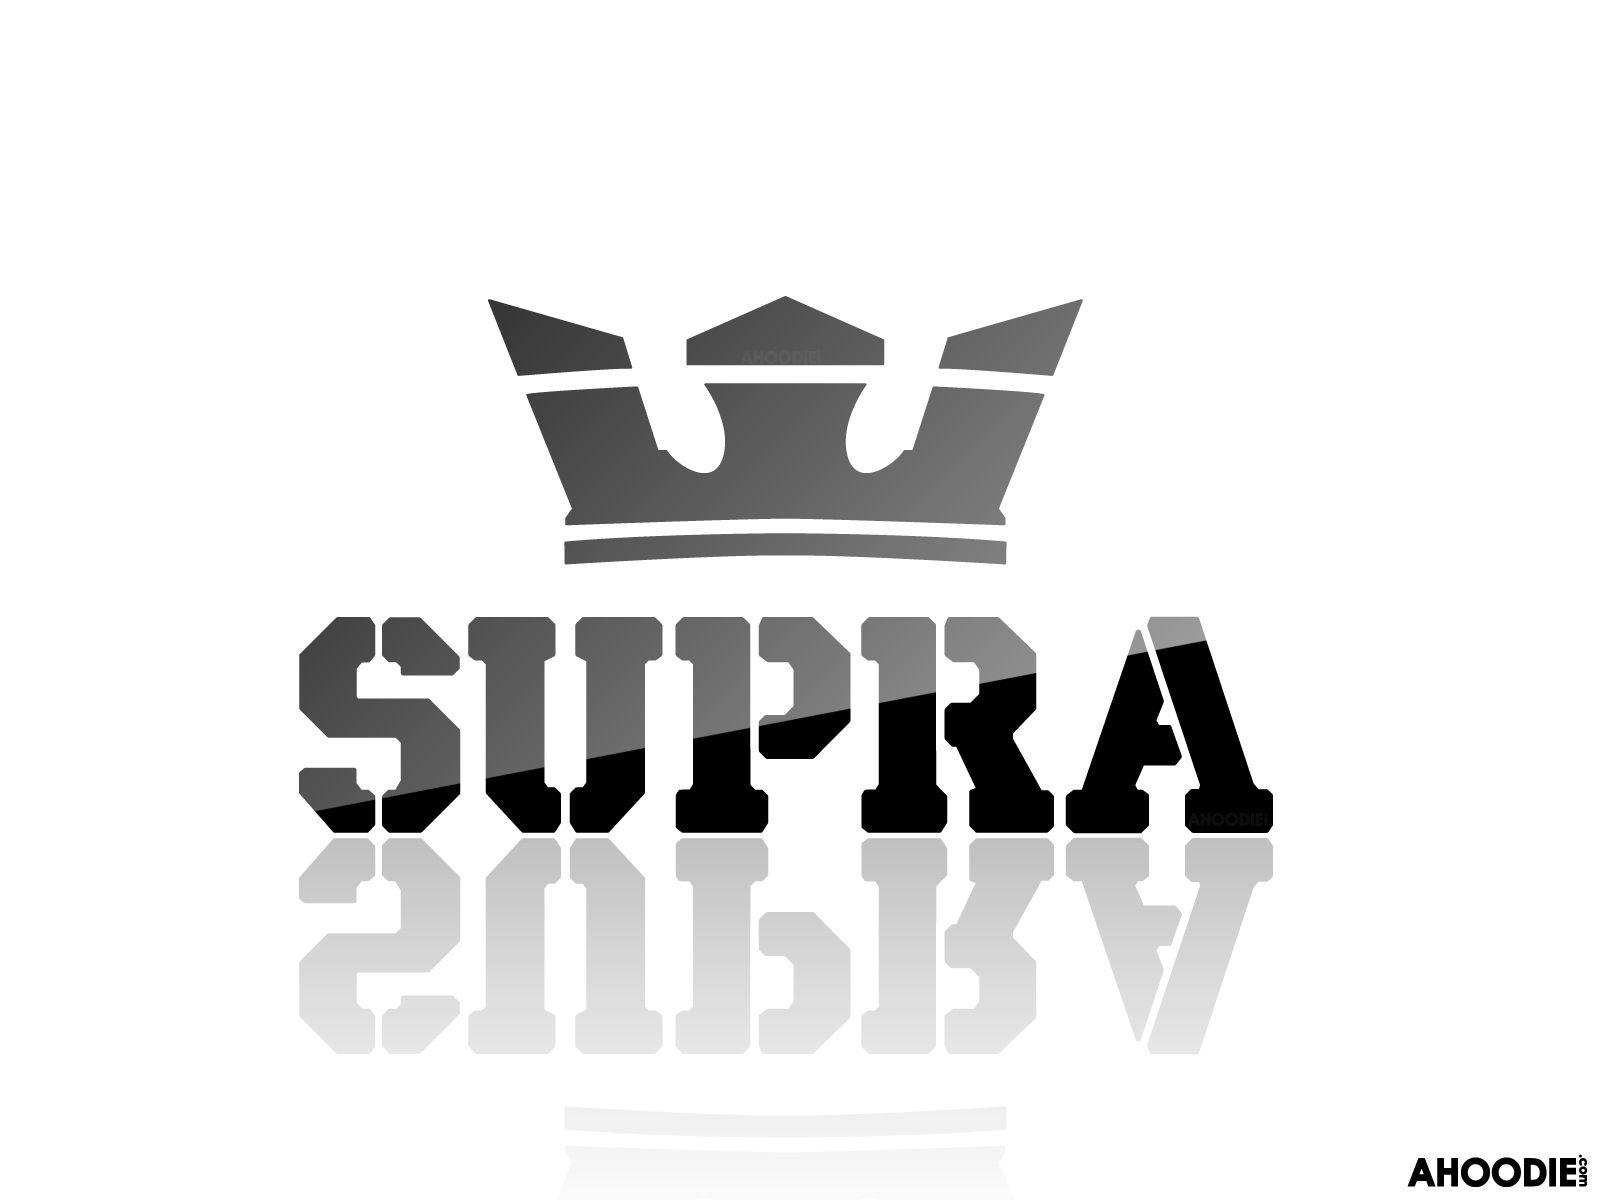 Supra Footwear Wallpapers 1600x1200